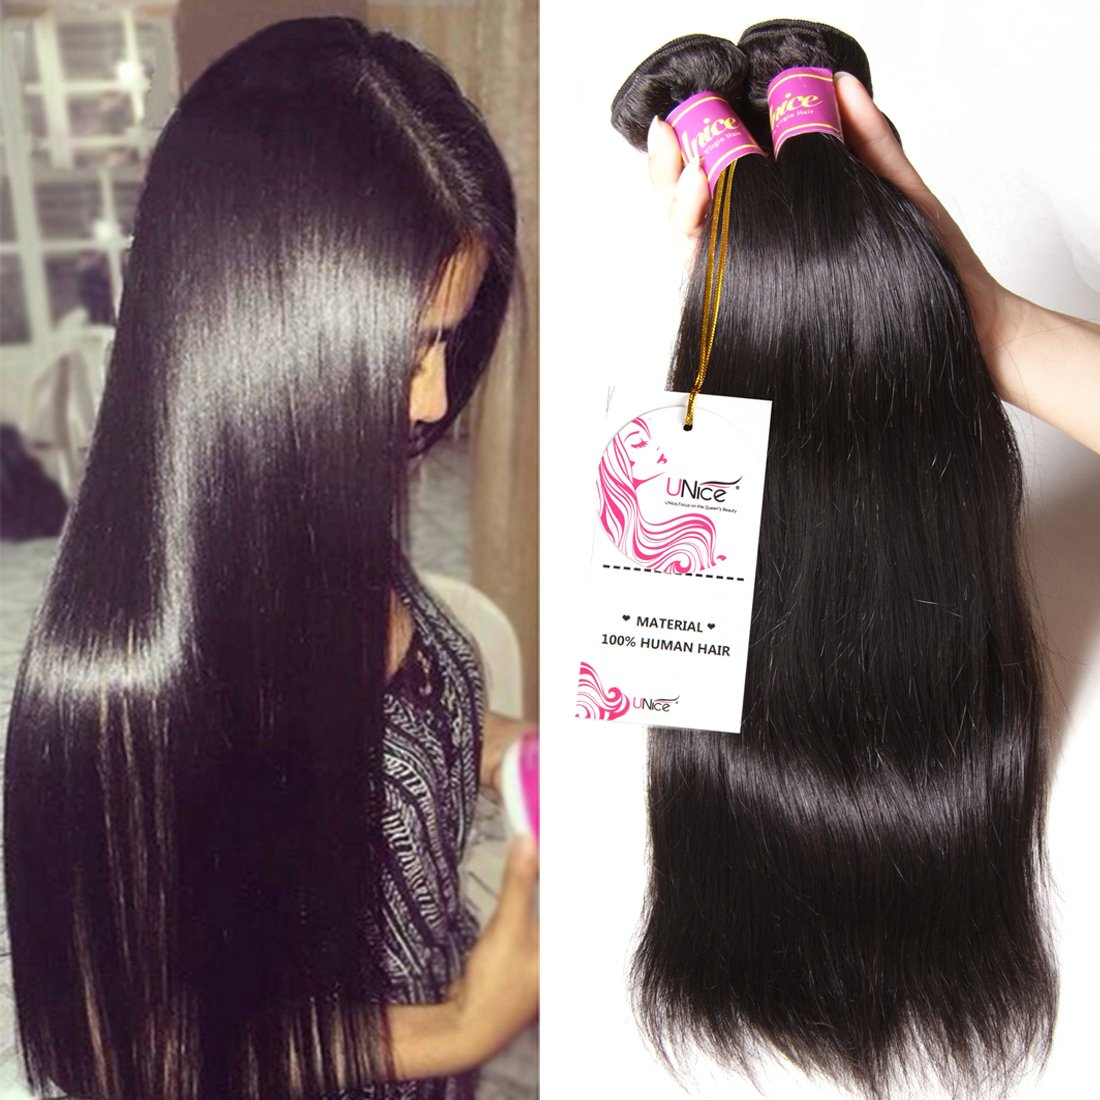 Unice Hair 7a Malaysian Straight Hair 3 Bundles Virgin Unprocessed Human Hair Wefts Hair Extensions Deal with Mixed Lengths 100% Human Hair Extensions (16 18 20, Natural Black)